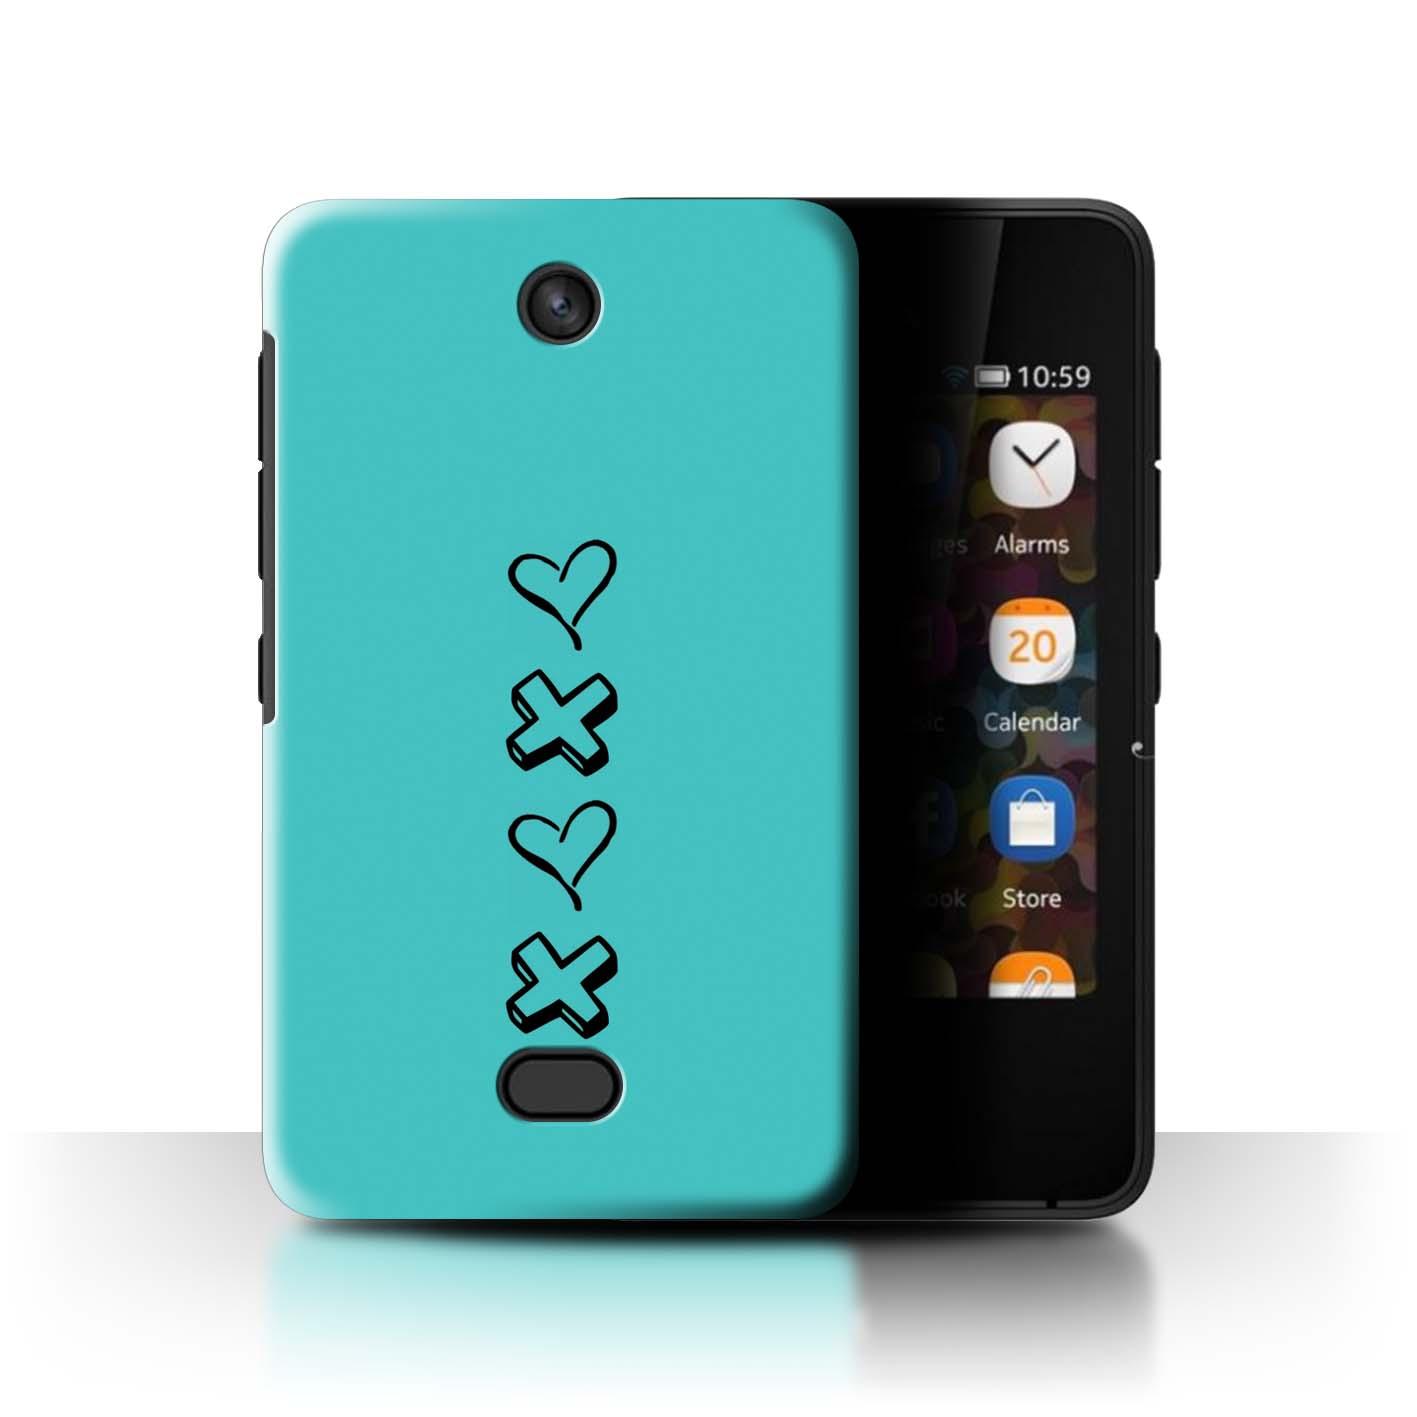 Stuff4 Hülle/Case/Backcover für Nokia Asha 501/Herz XOXO